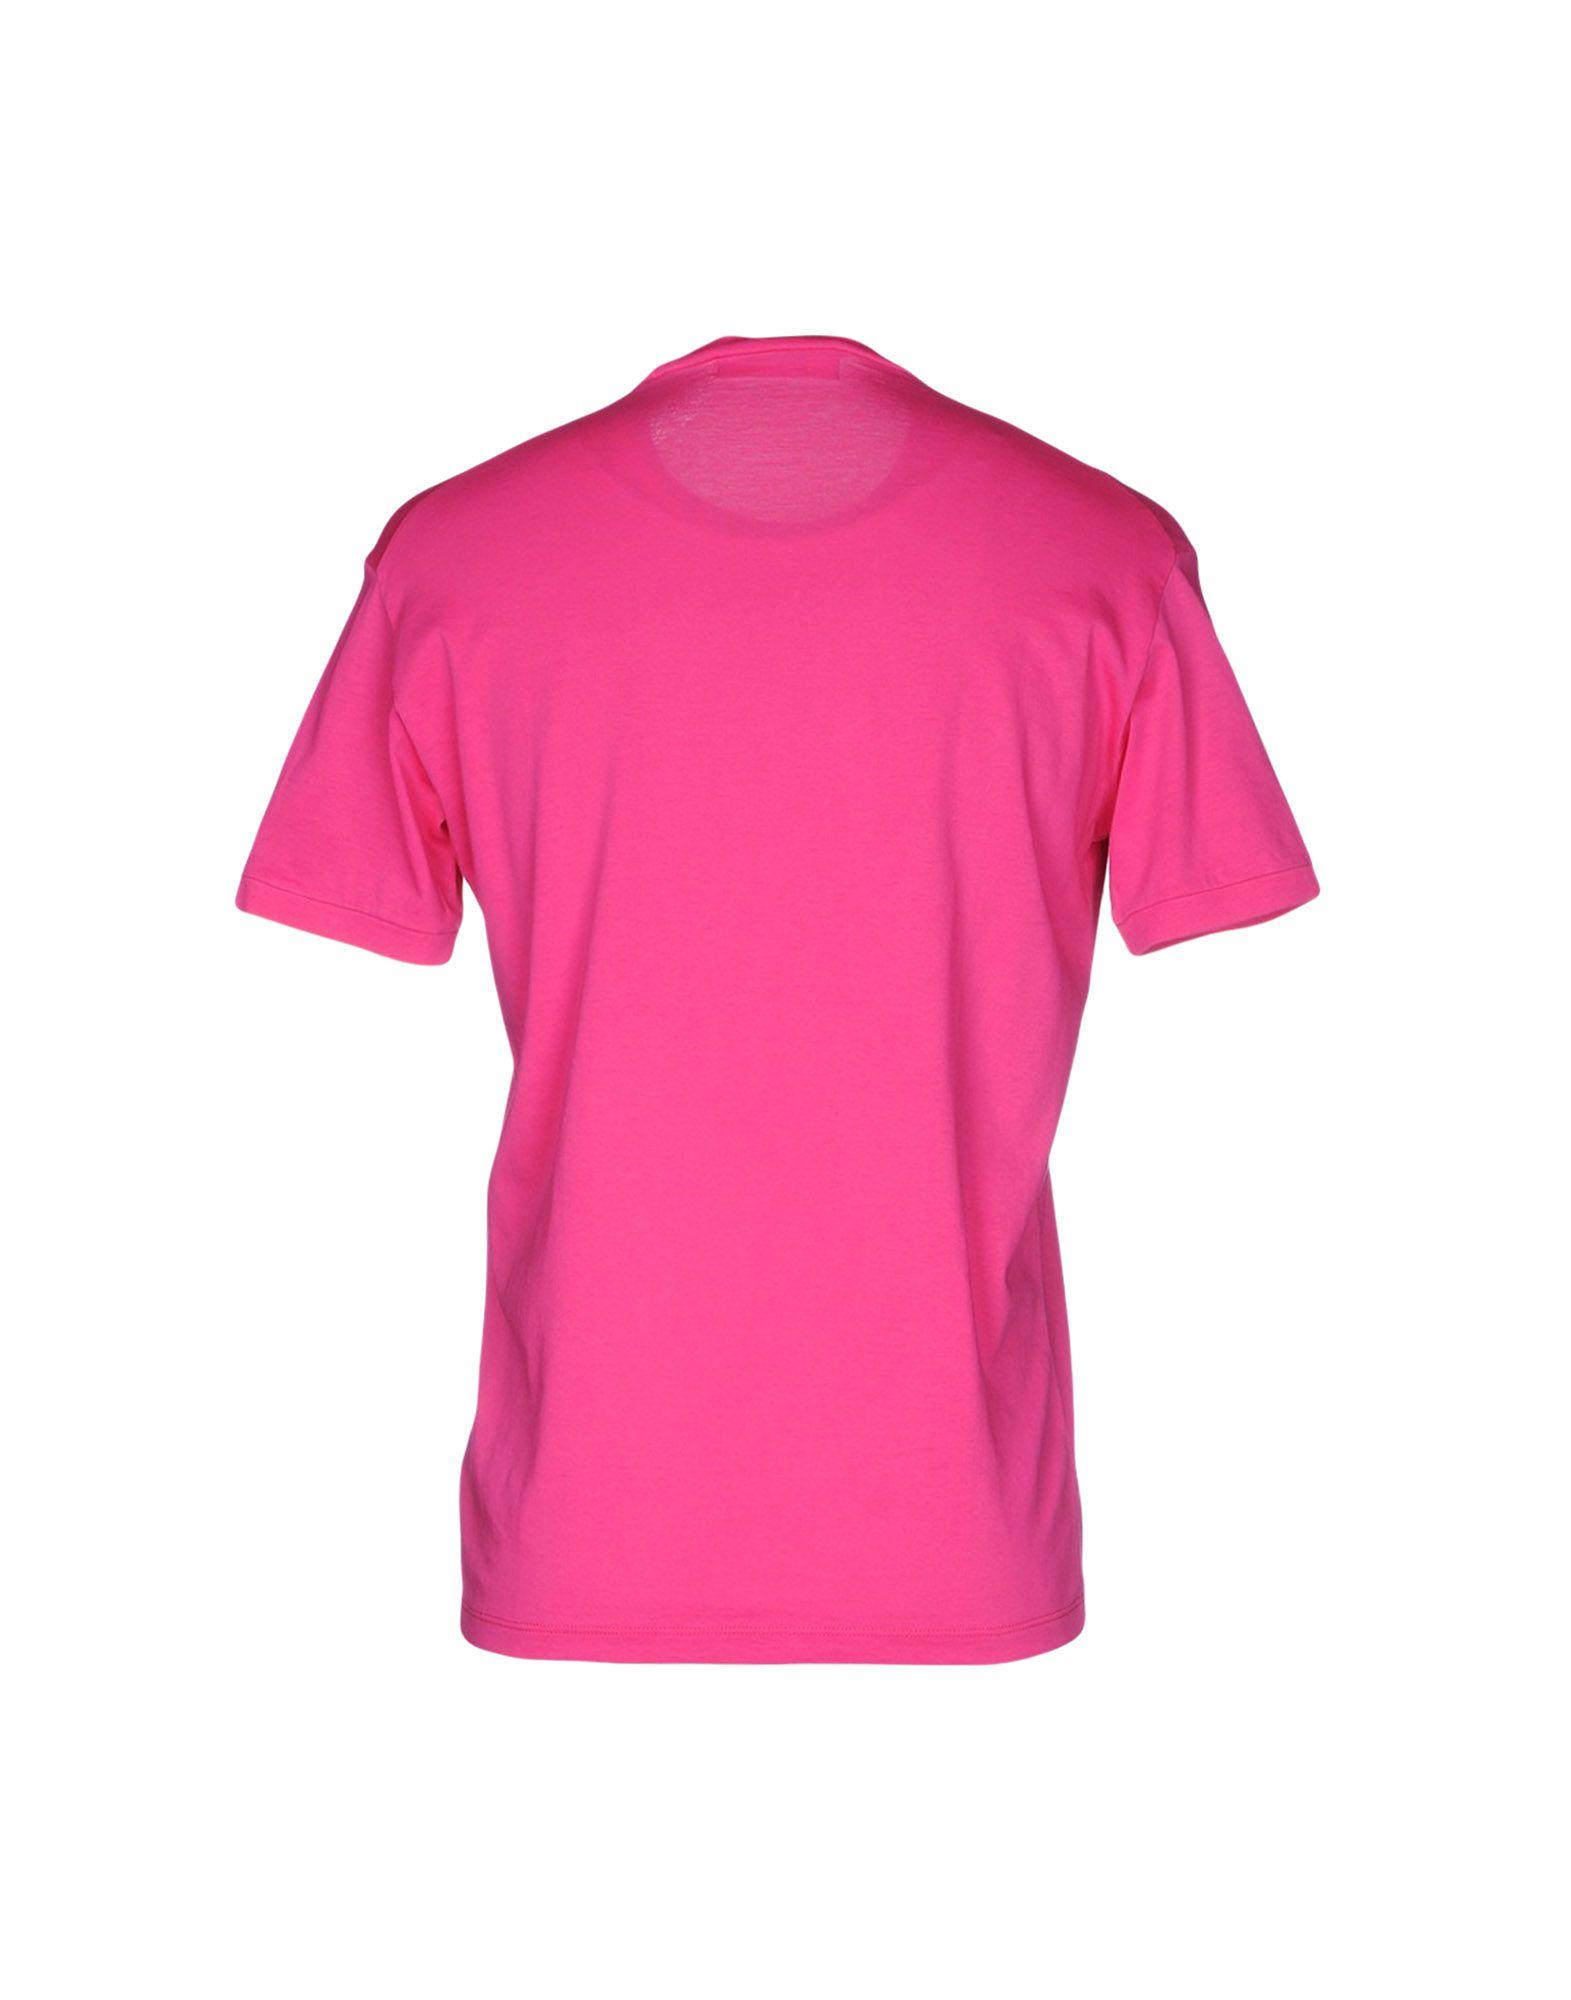 A buon mercato T-Shirt Dsquarosso2 Uomo 12051222KK - 12051222KK Uomo 7a2298